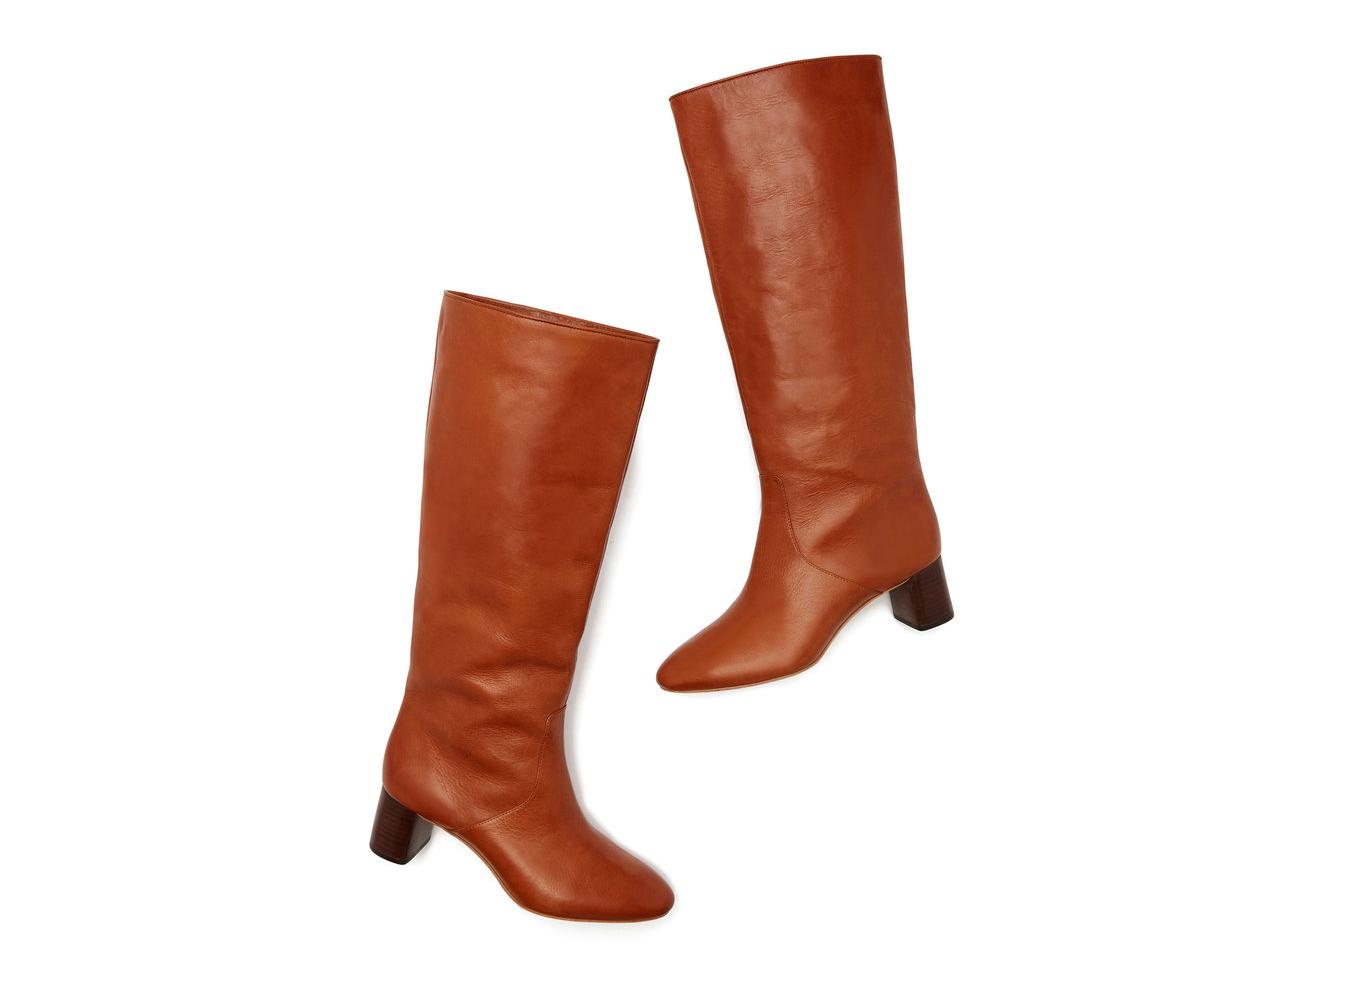 Loeffler Randall Gia Leather Boots